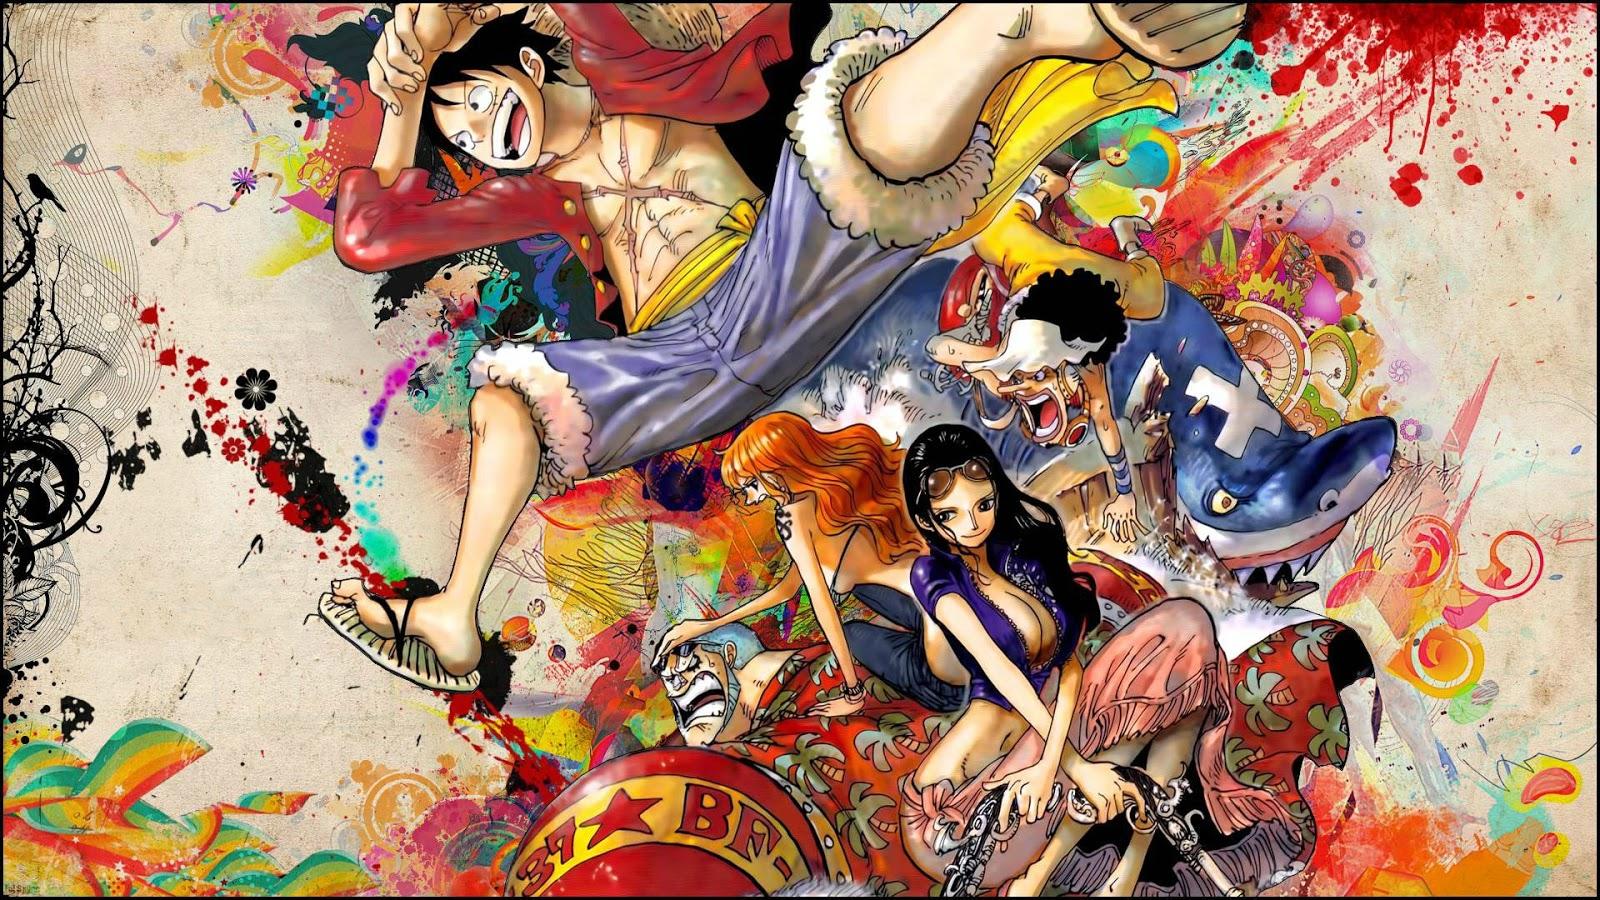 40+ HD One Piece Wallpapers 1920x1080 (2020)   www ...